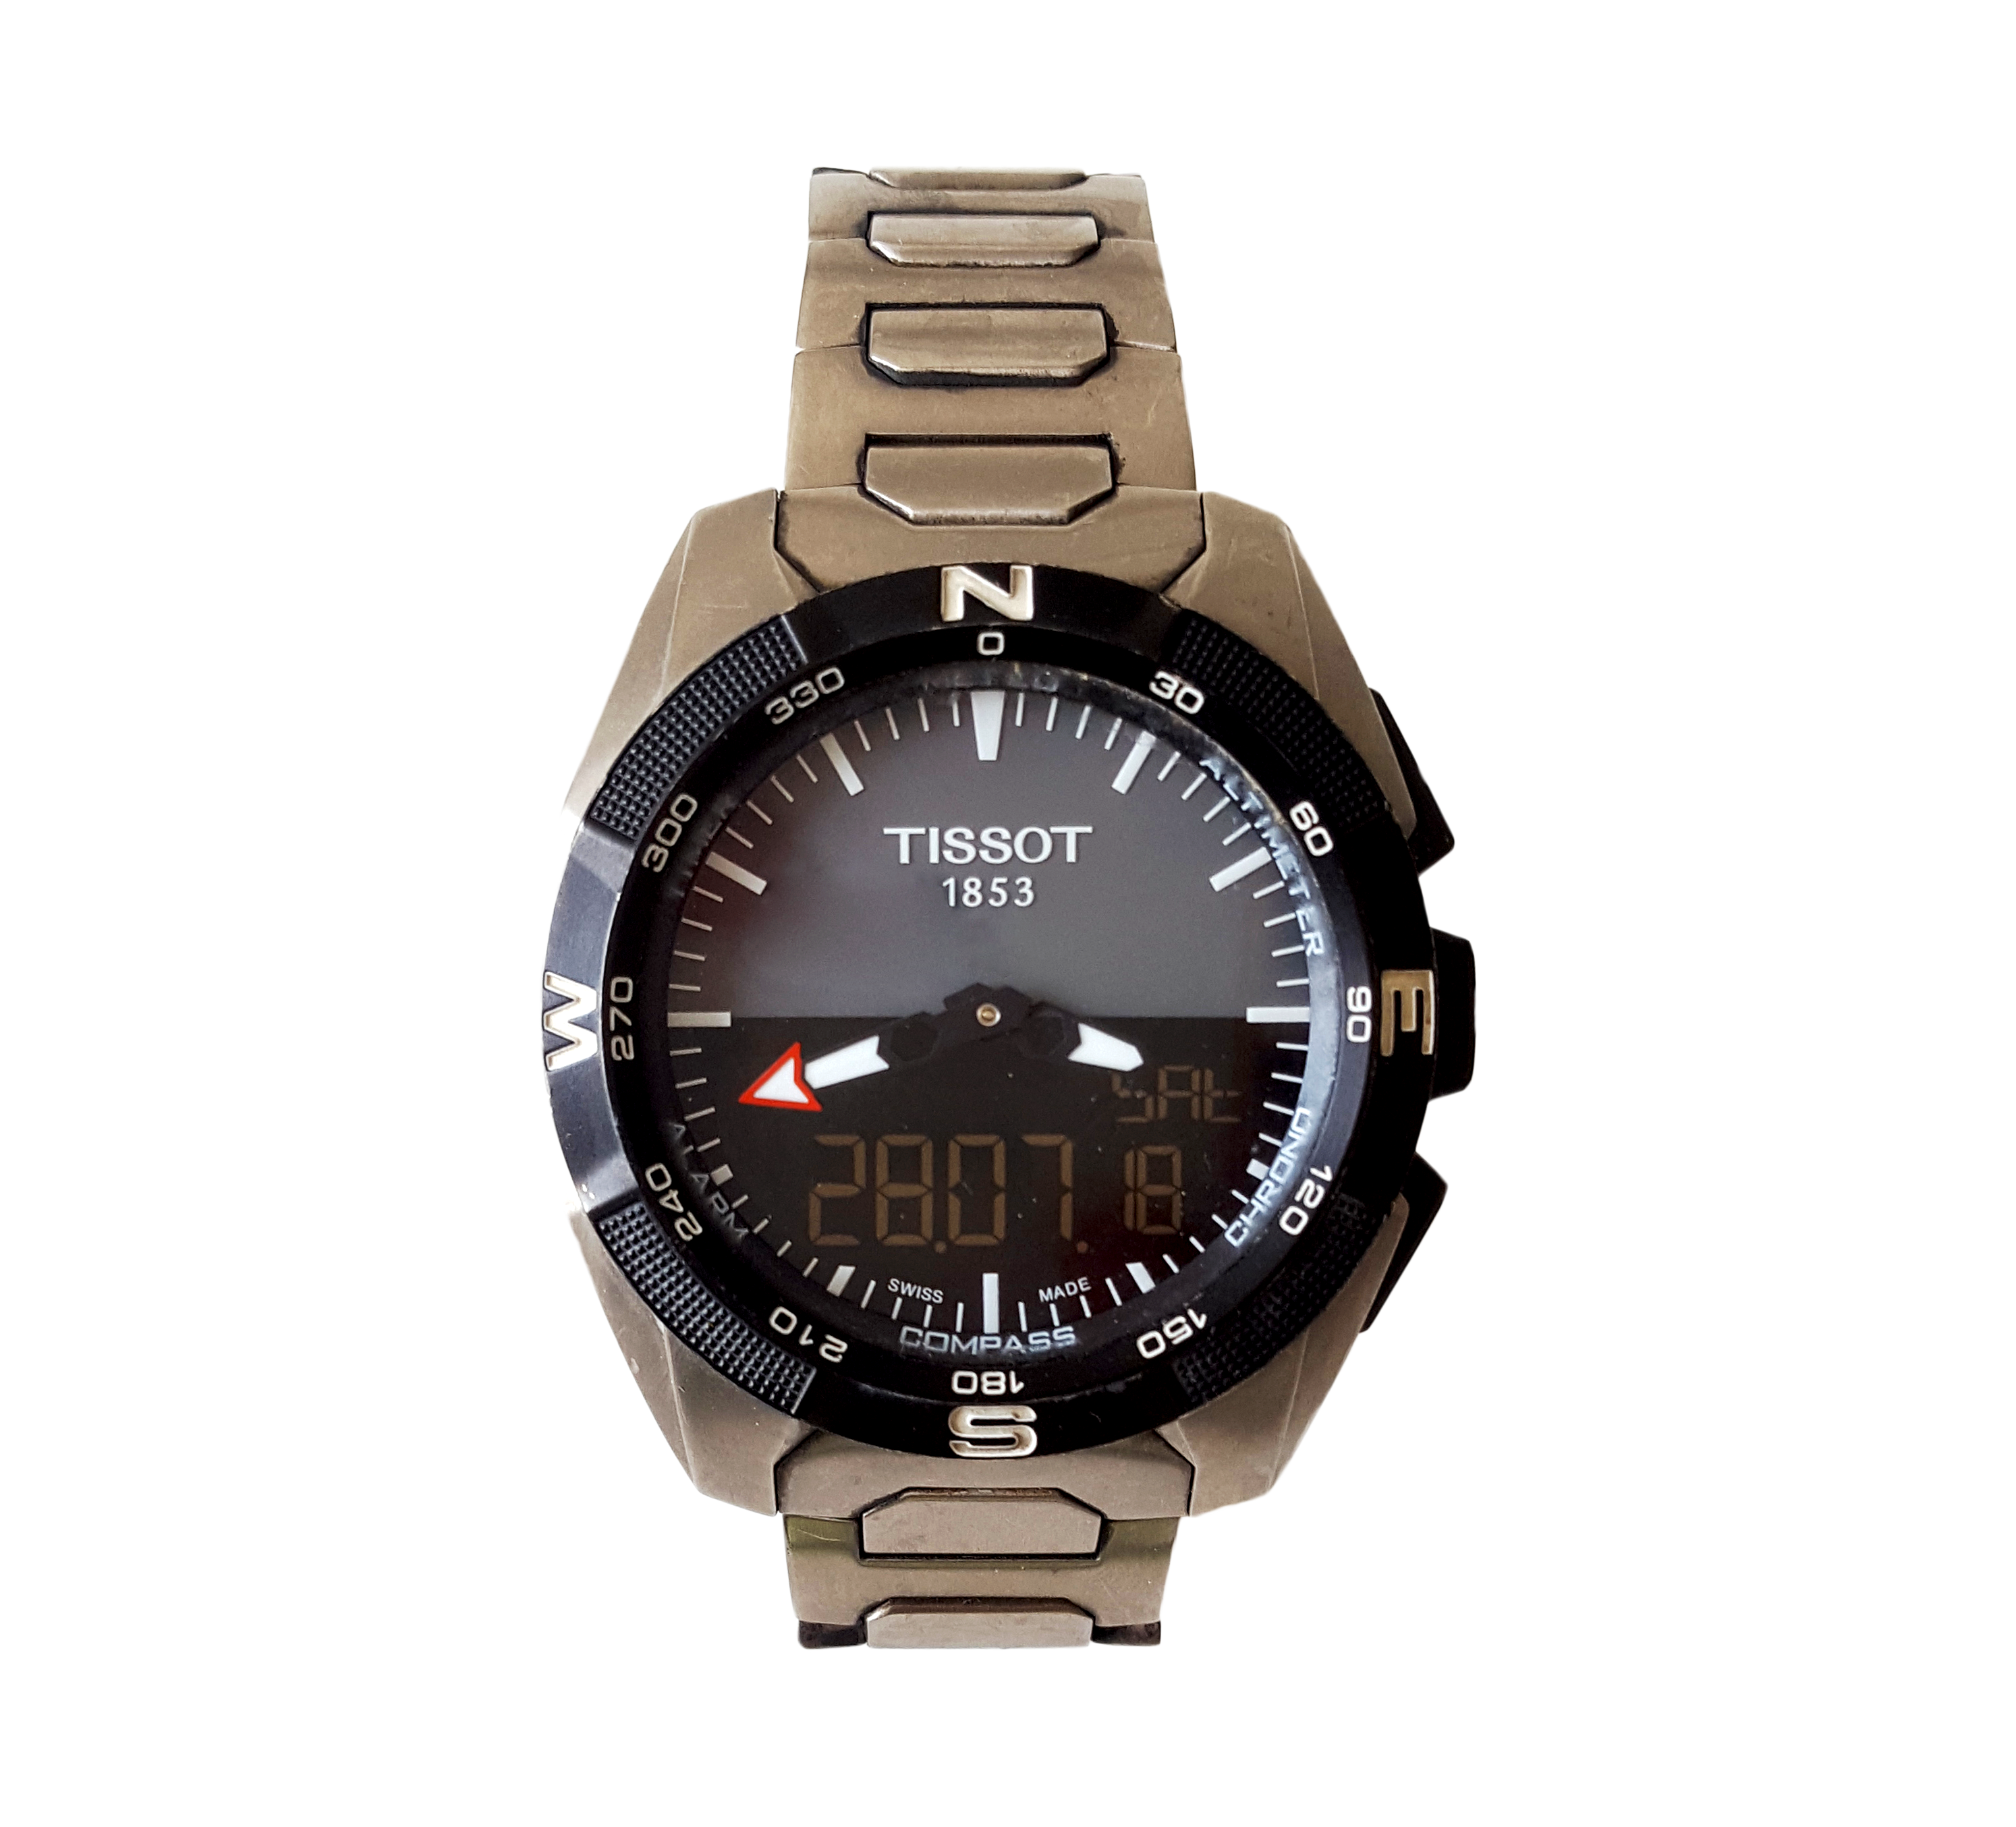 Tissot T-Touch Solar E84 PNG Image